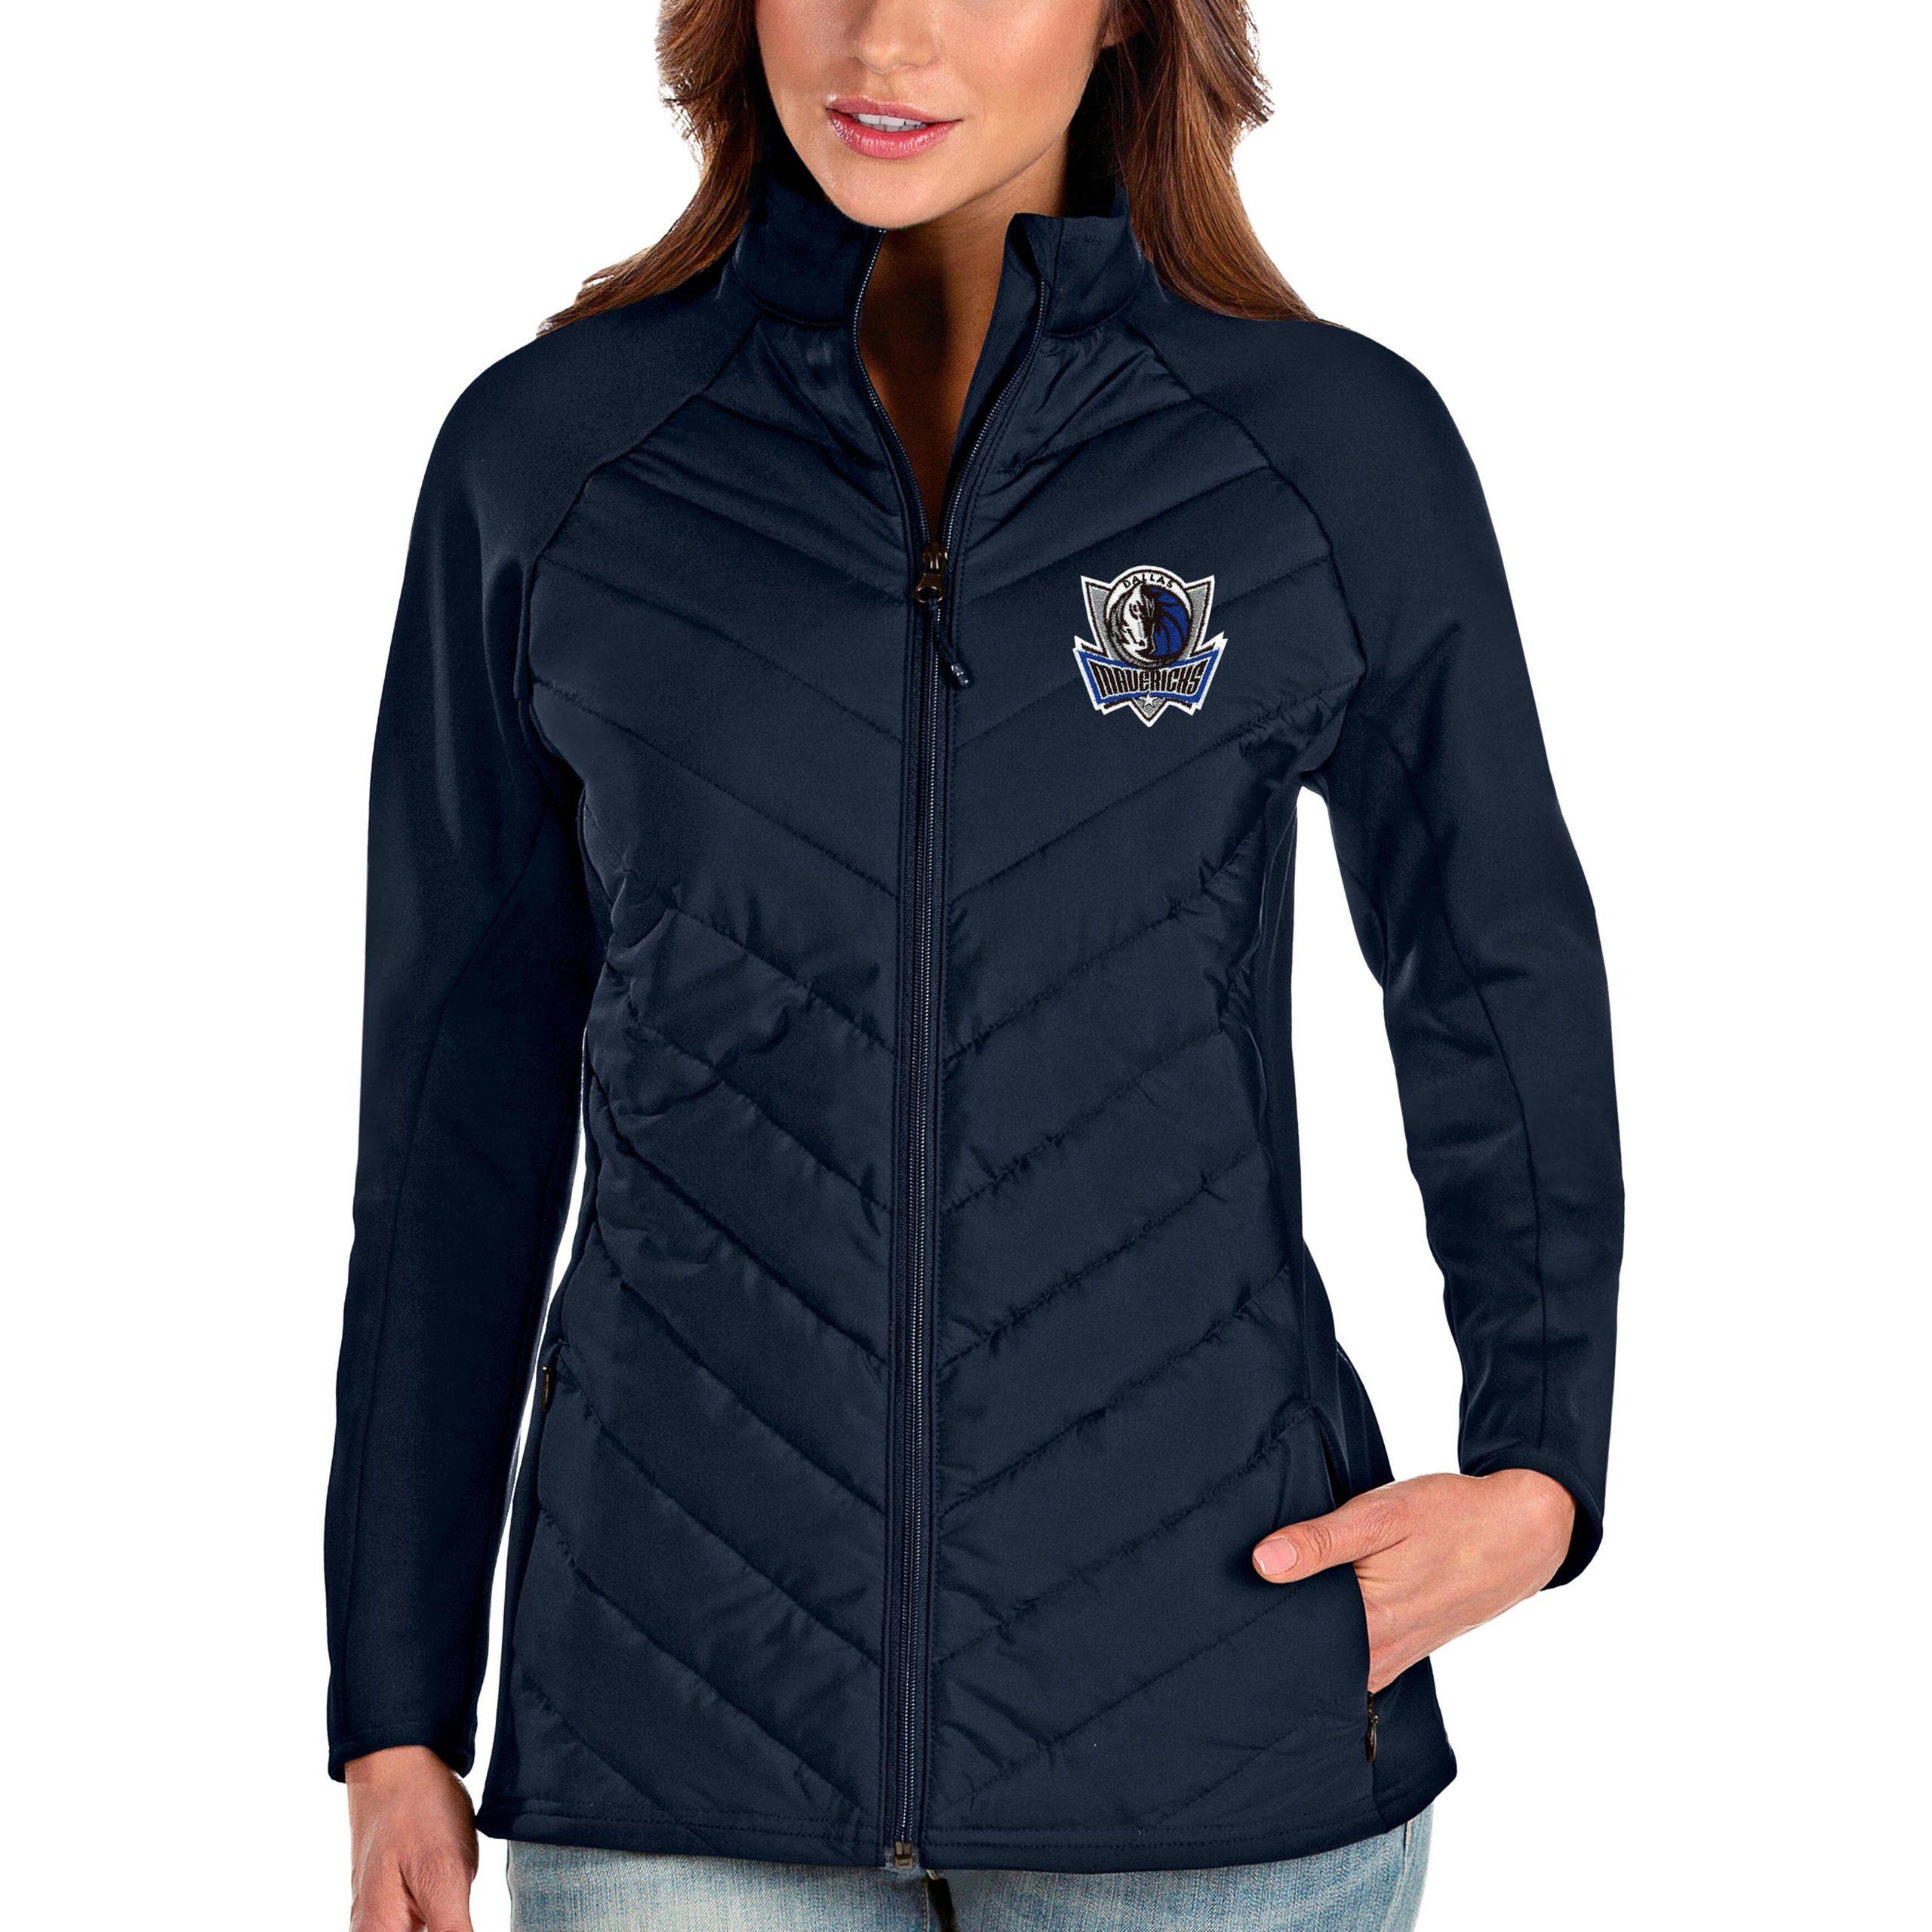 Dallas Mavericks Antigua Women's Altitude Full-Zip Jacket - Navy